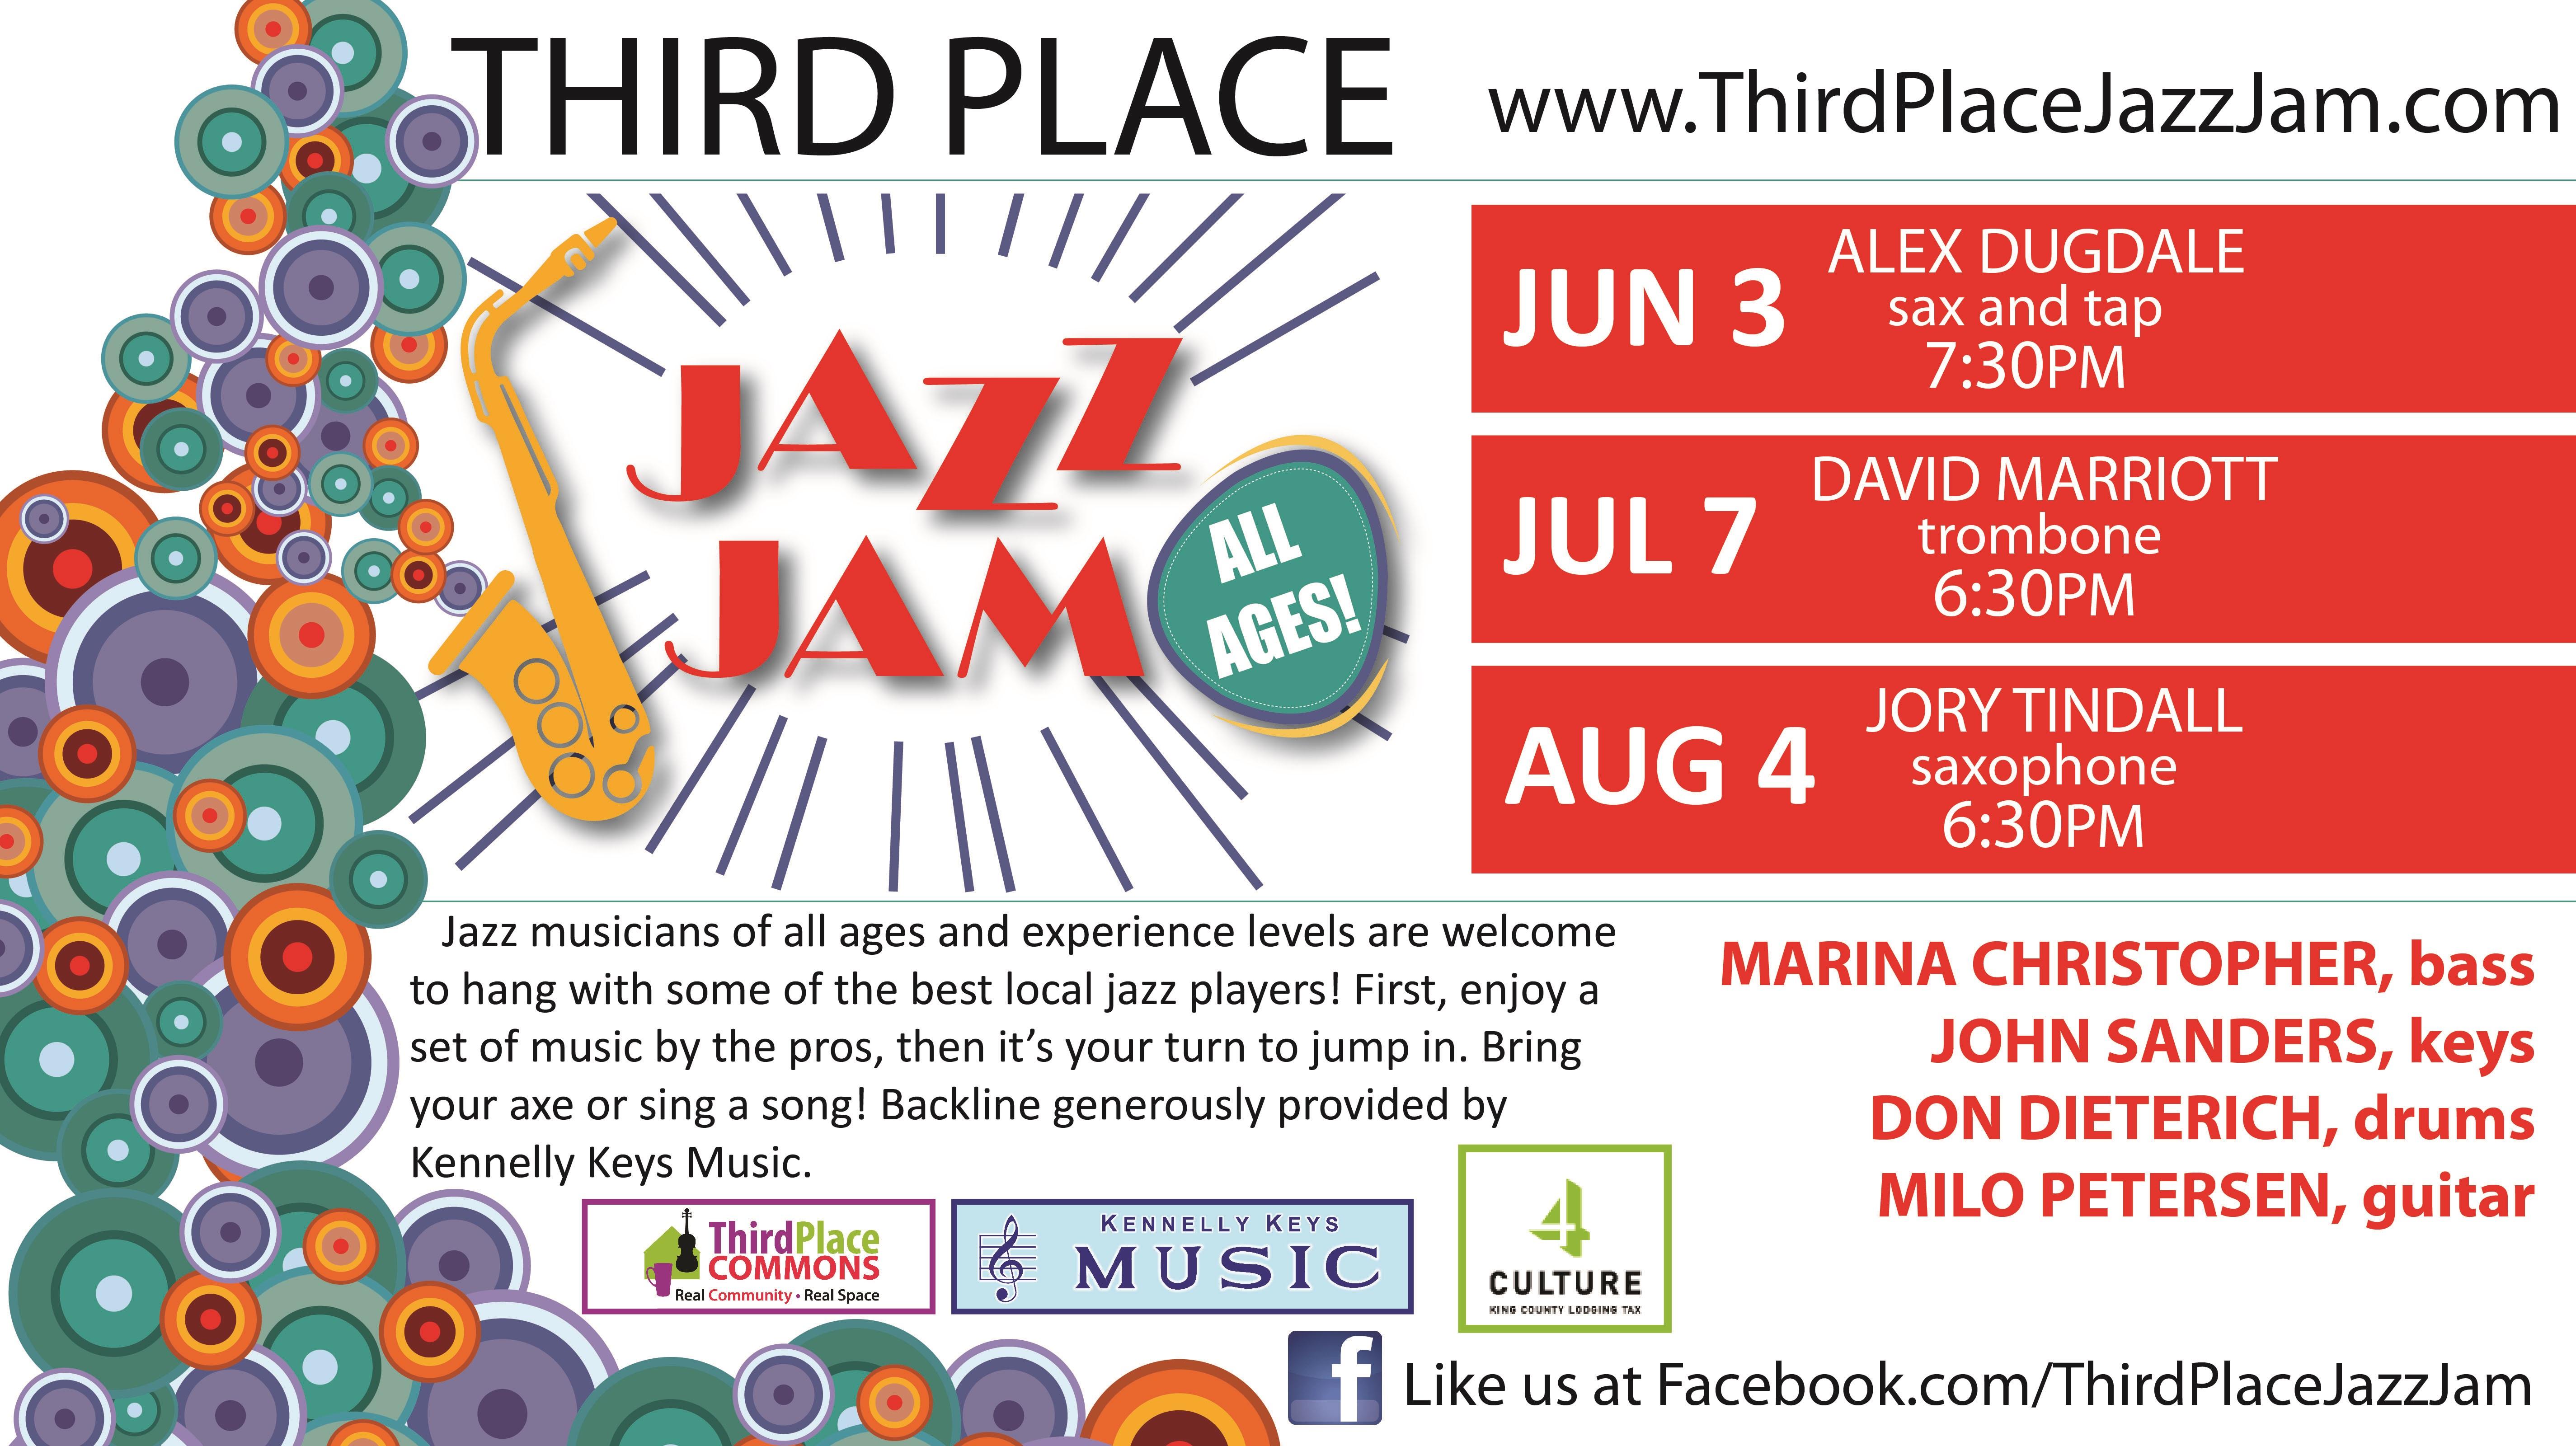 Third Place Jazz Jam